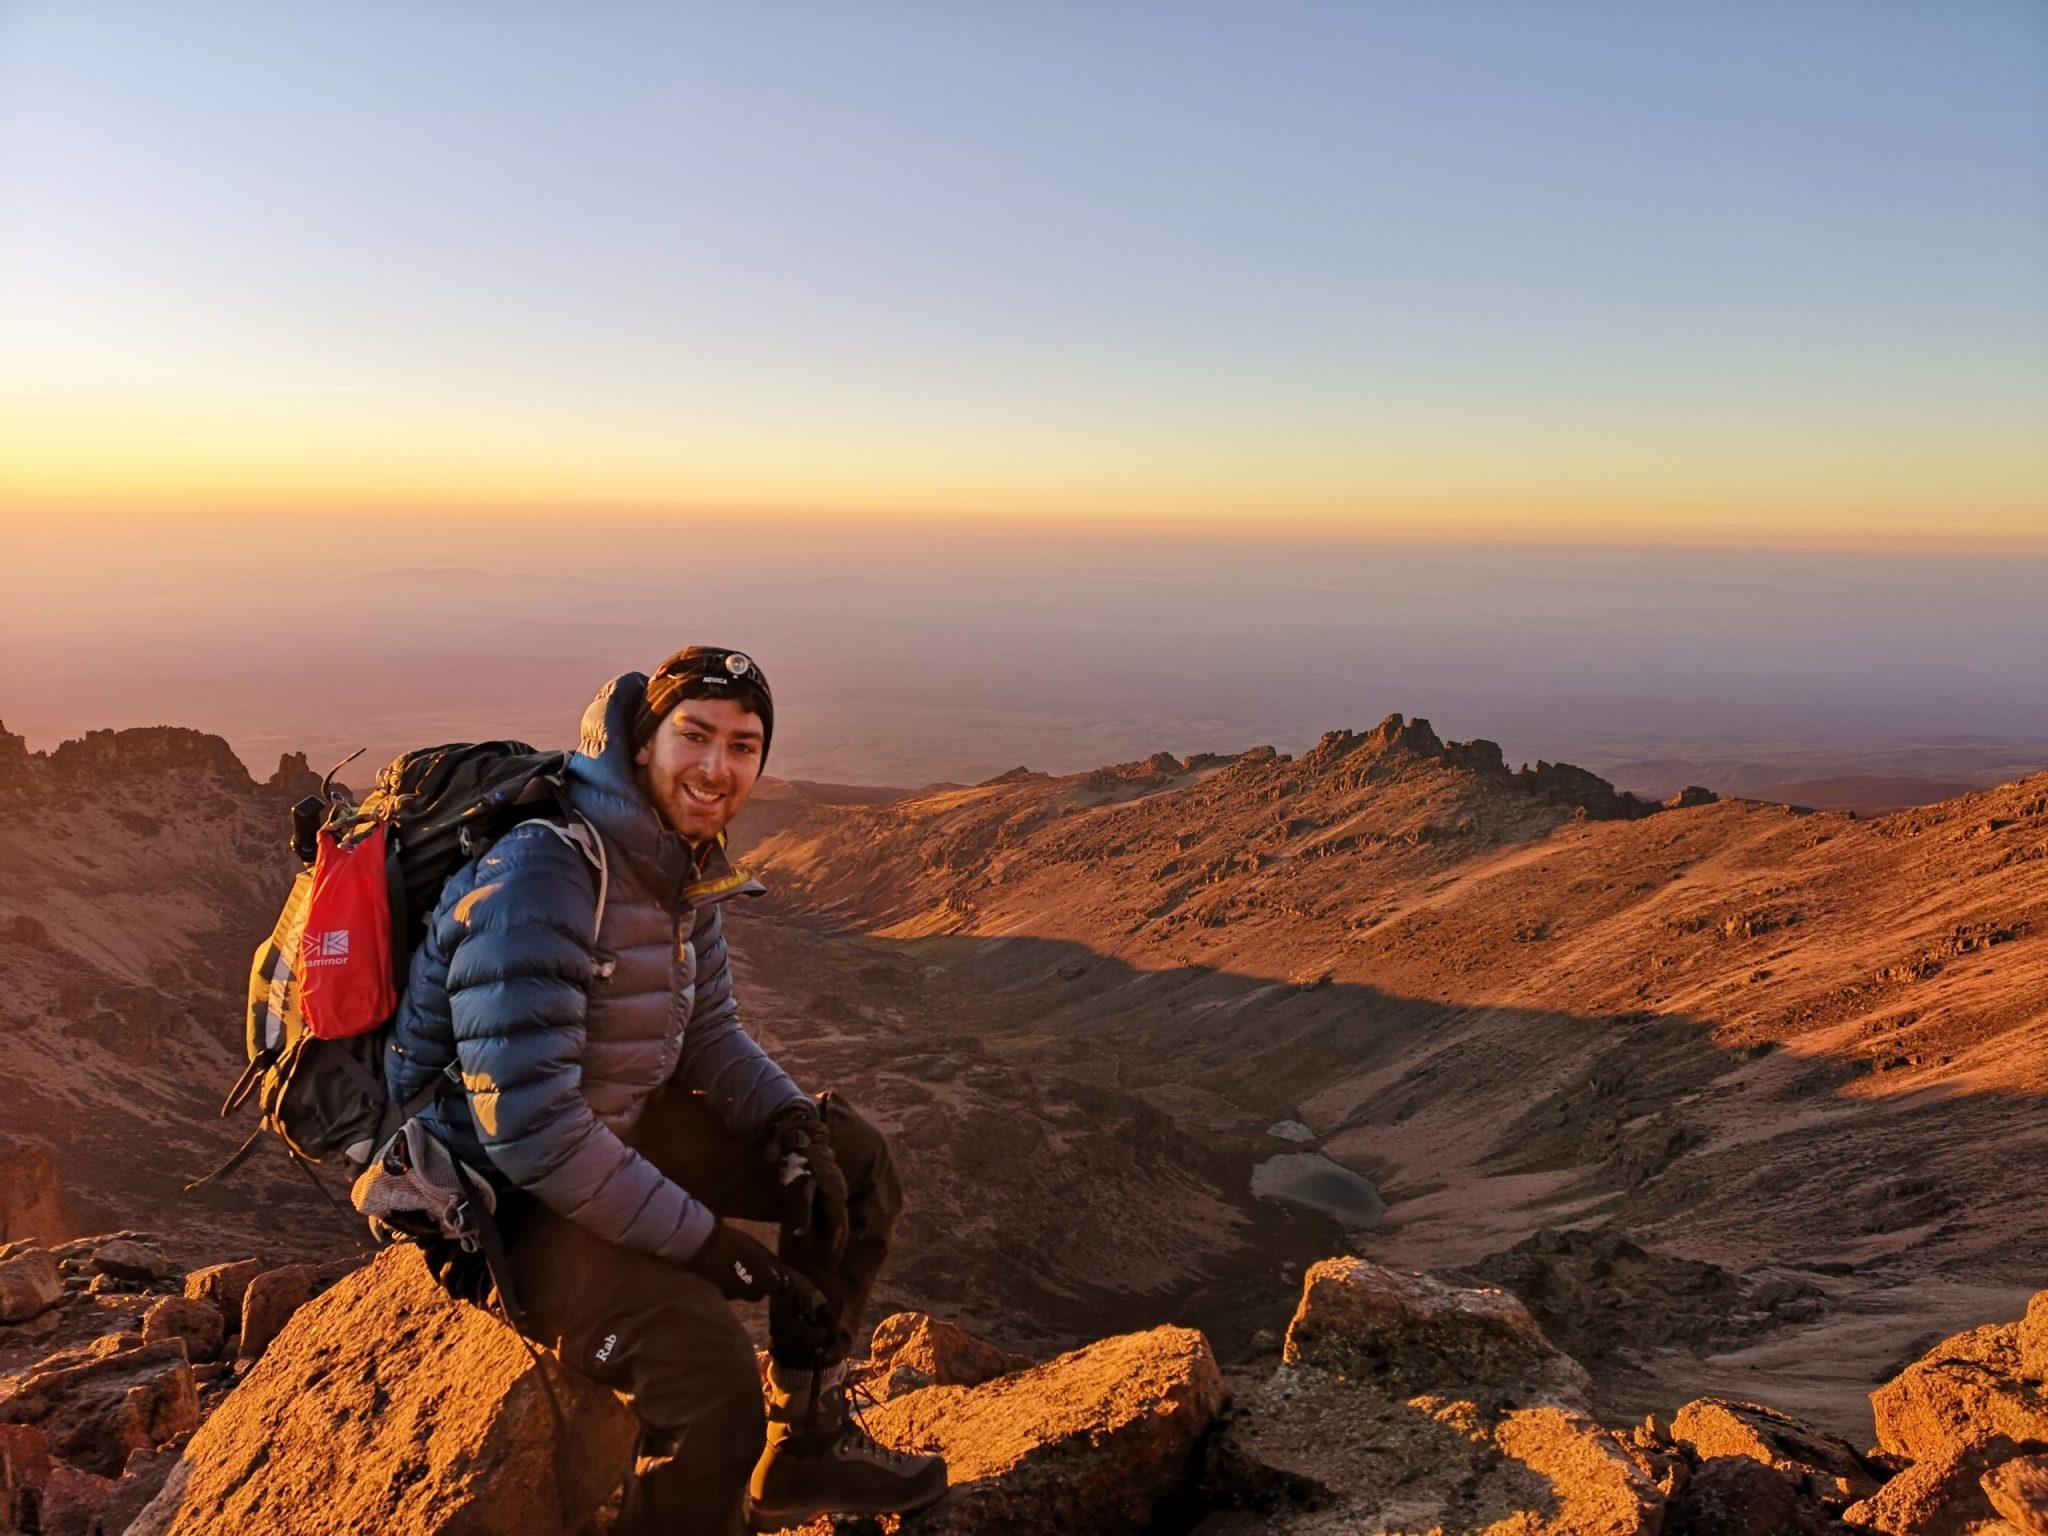 Matt on a mountain in Kenya.